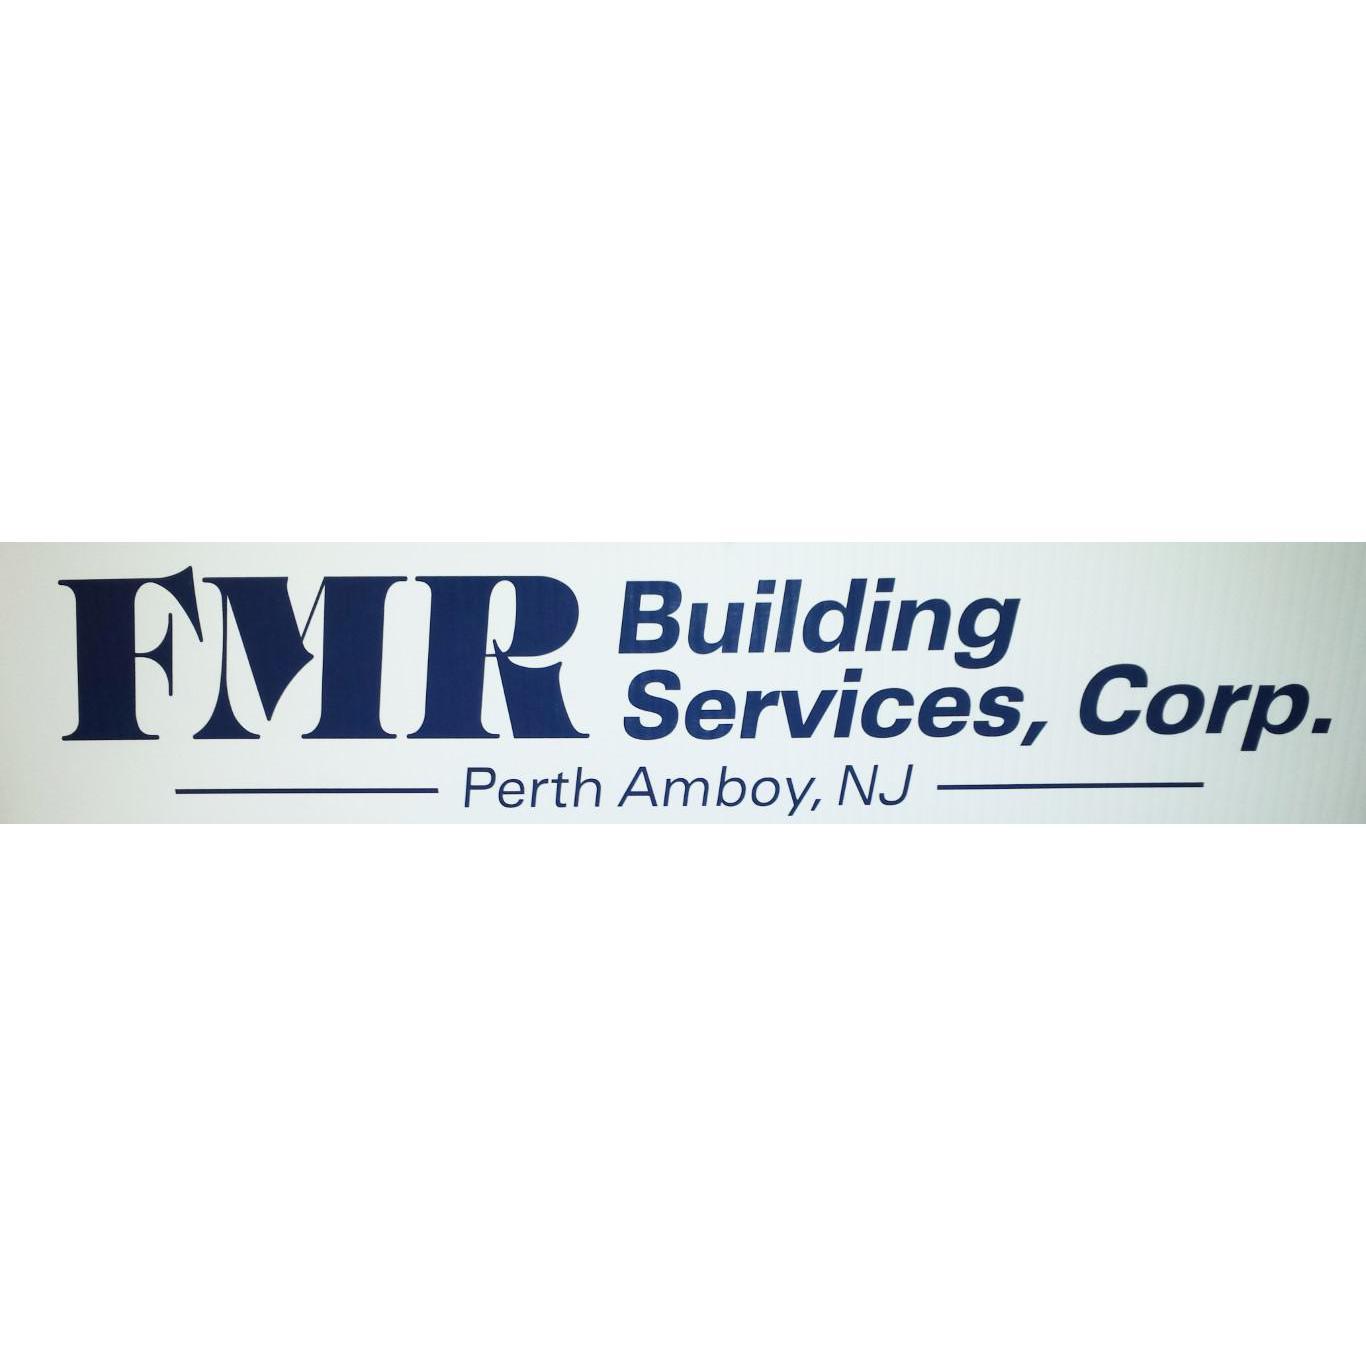 FMR Building Services Corp